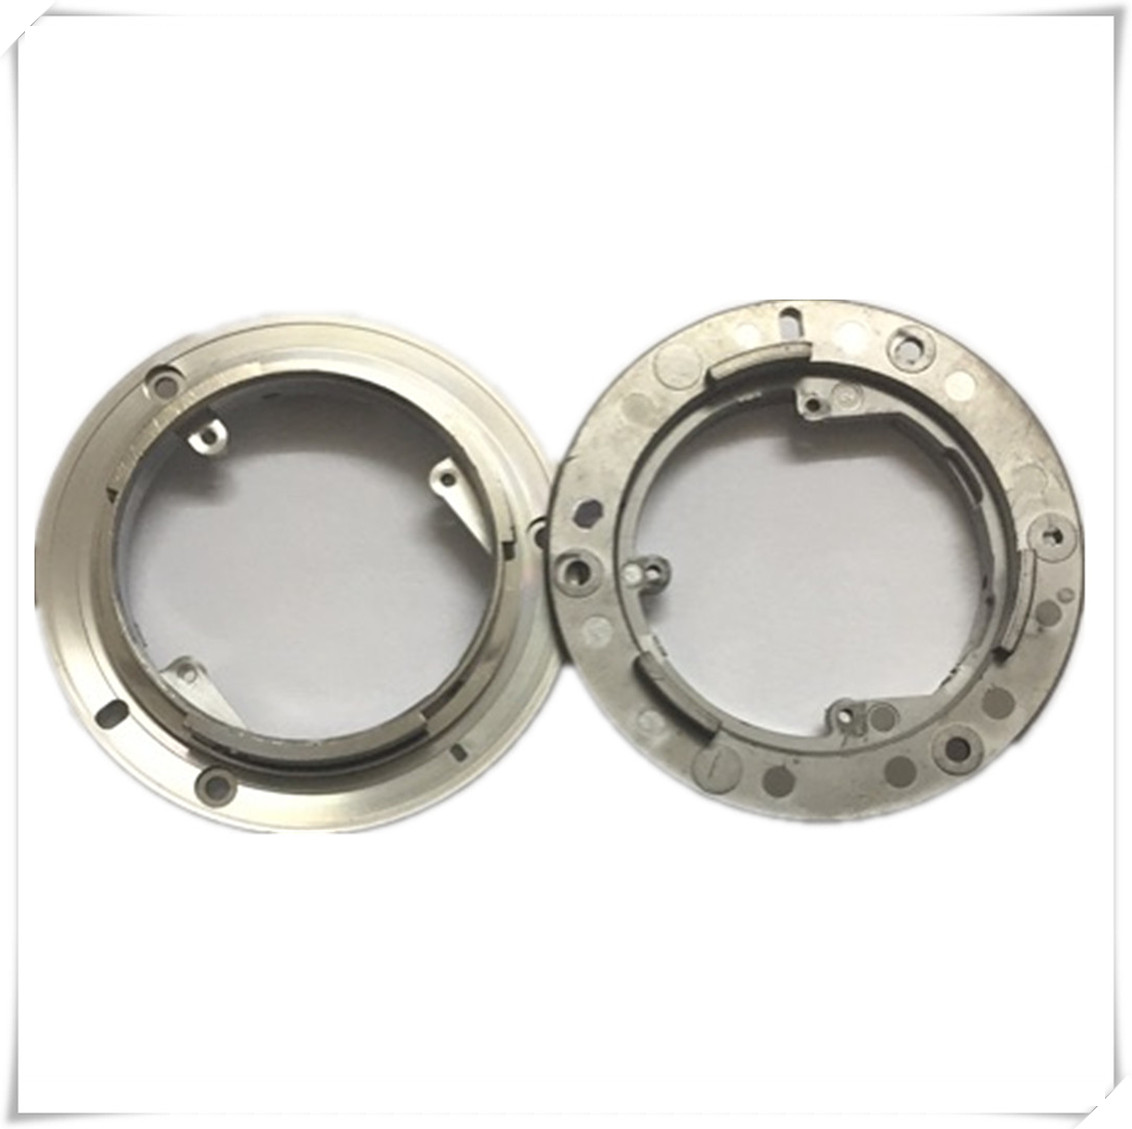 Original  Camera Lens repair and replacement parts 10 30 bayonet lens mount ring for Nikon 10 30 bayonet mount|ring for|ring for nikon|ring ring - title=